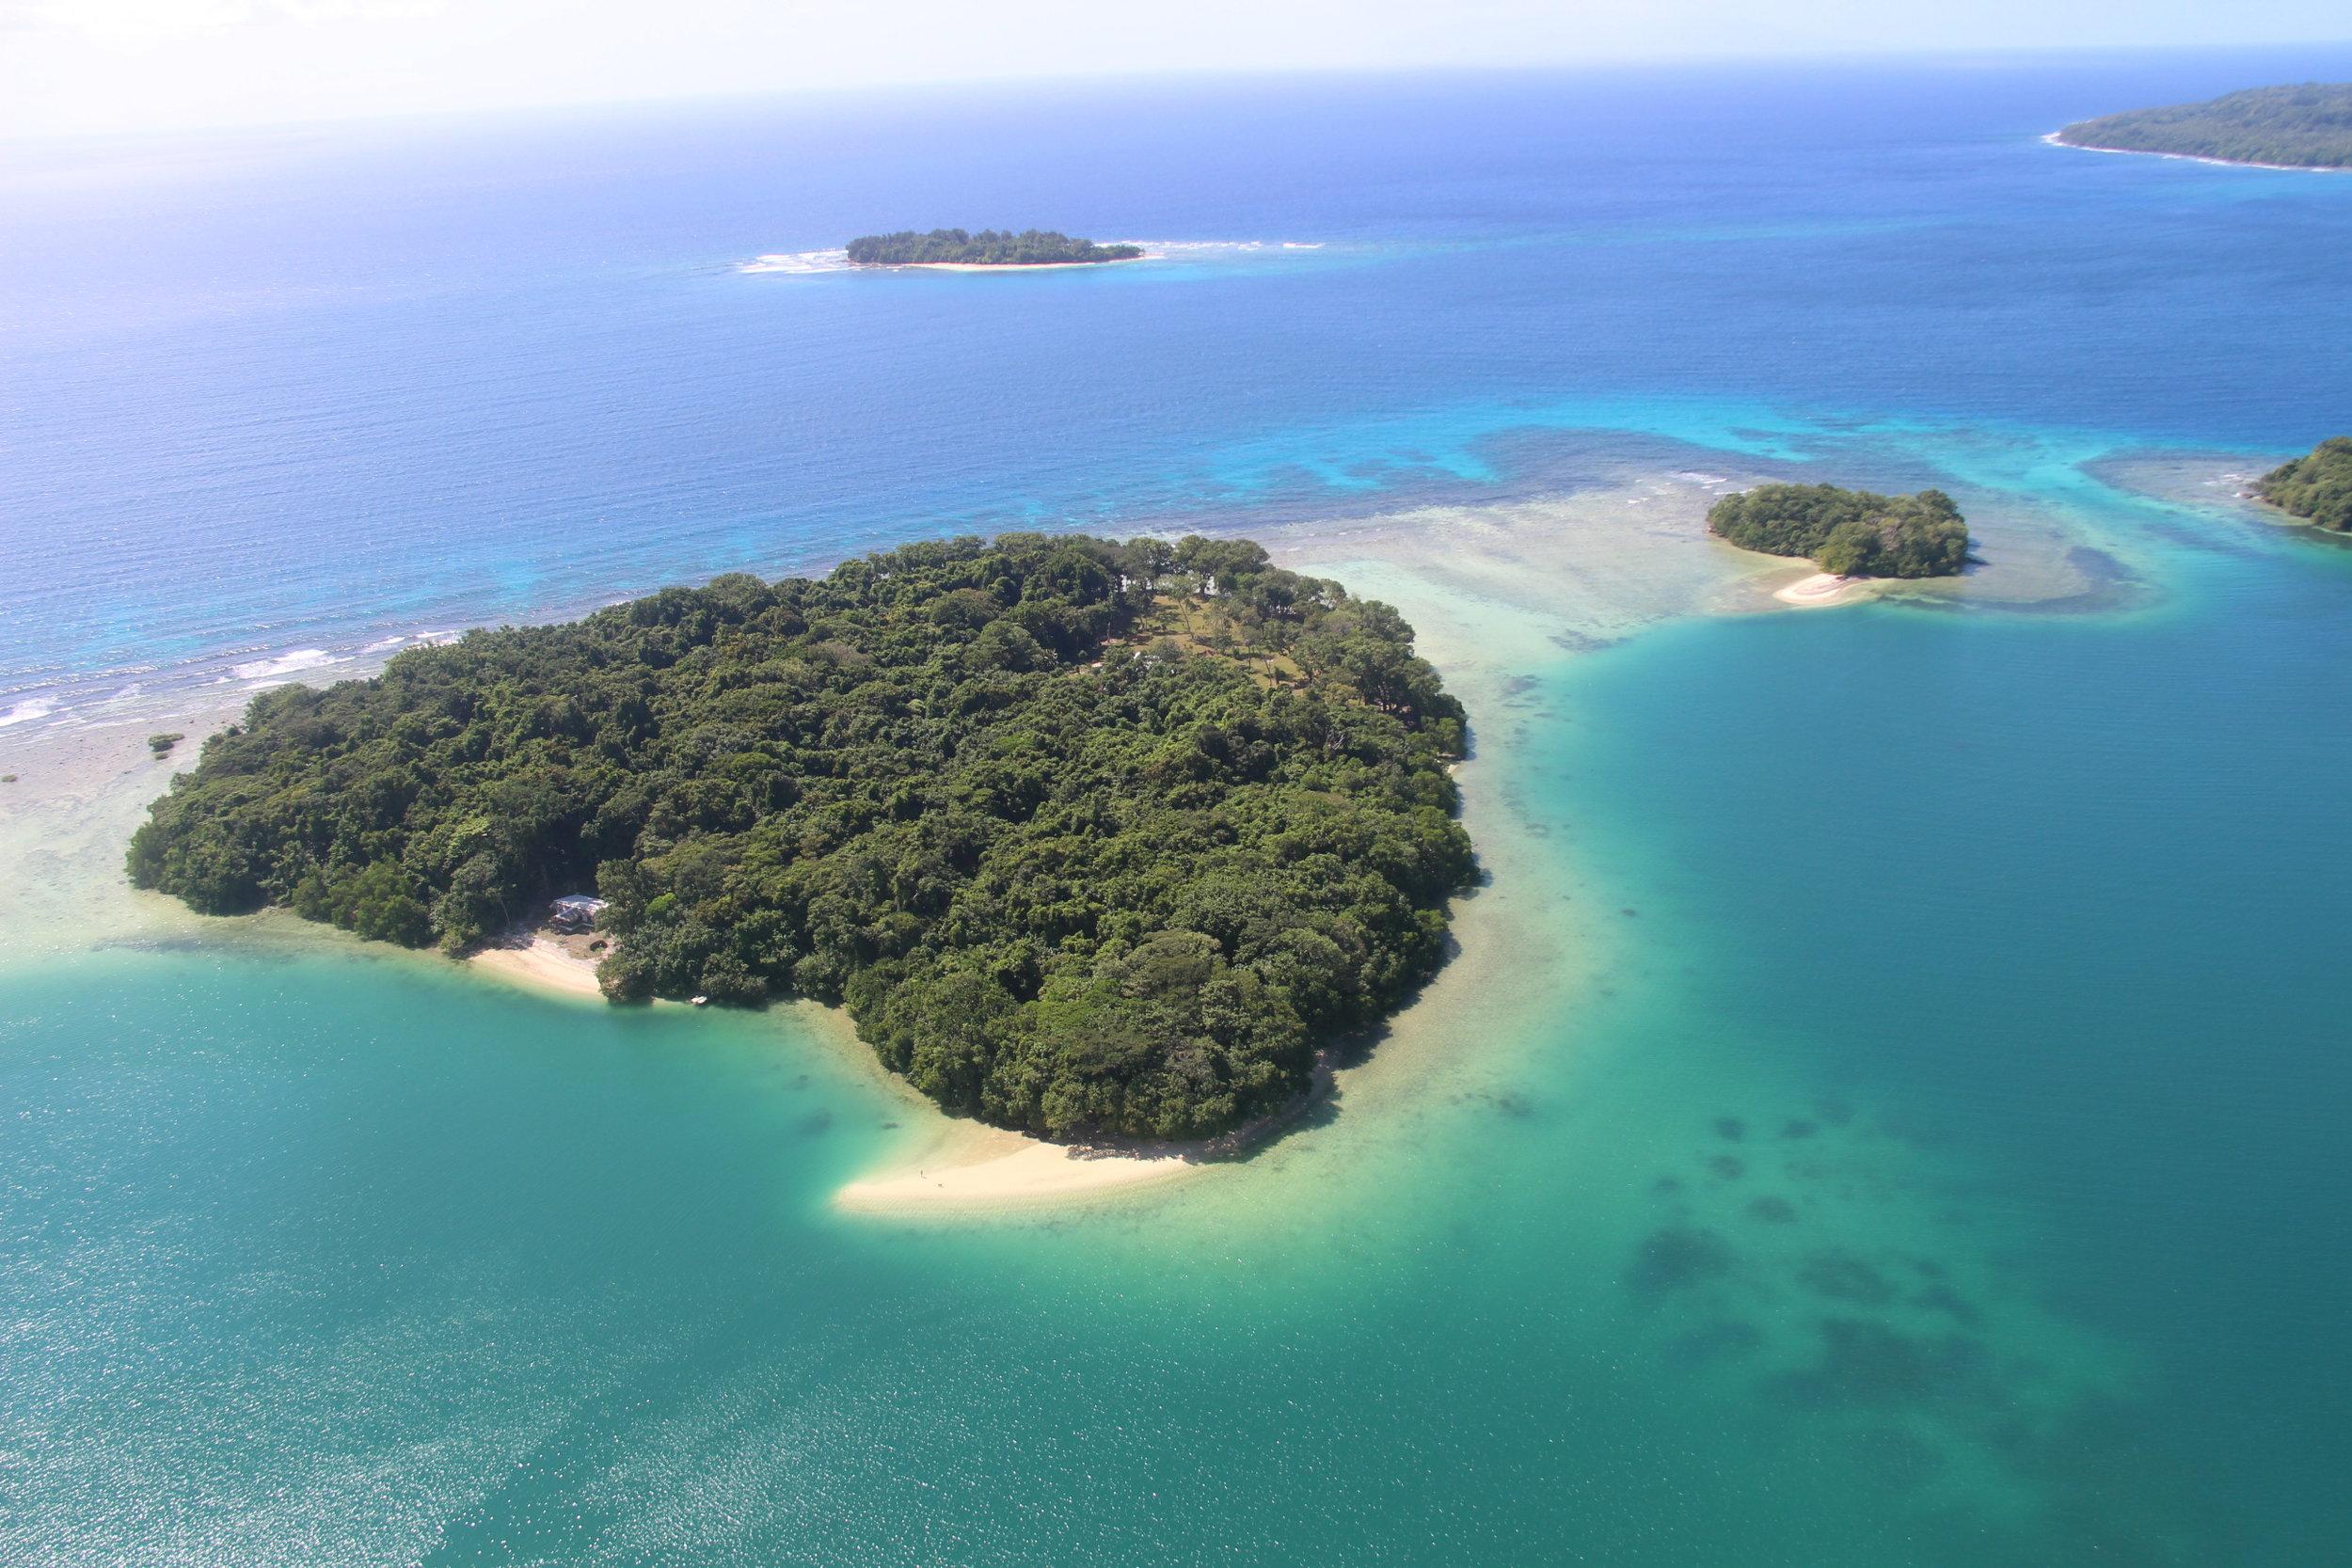 lenji island photo.jpg